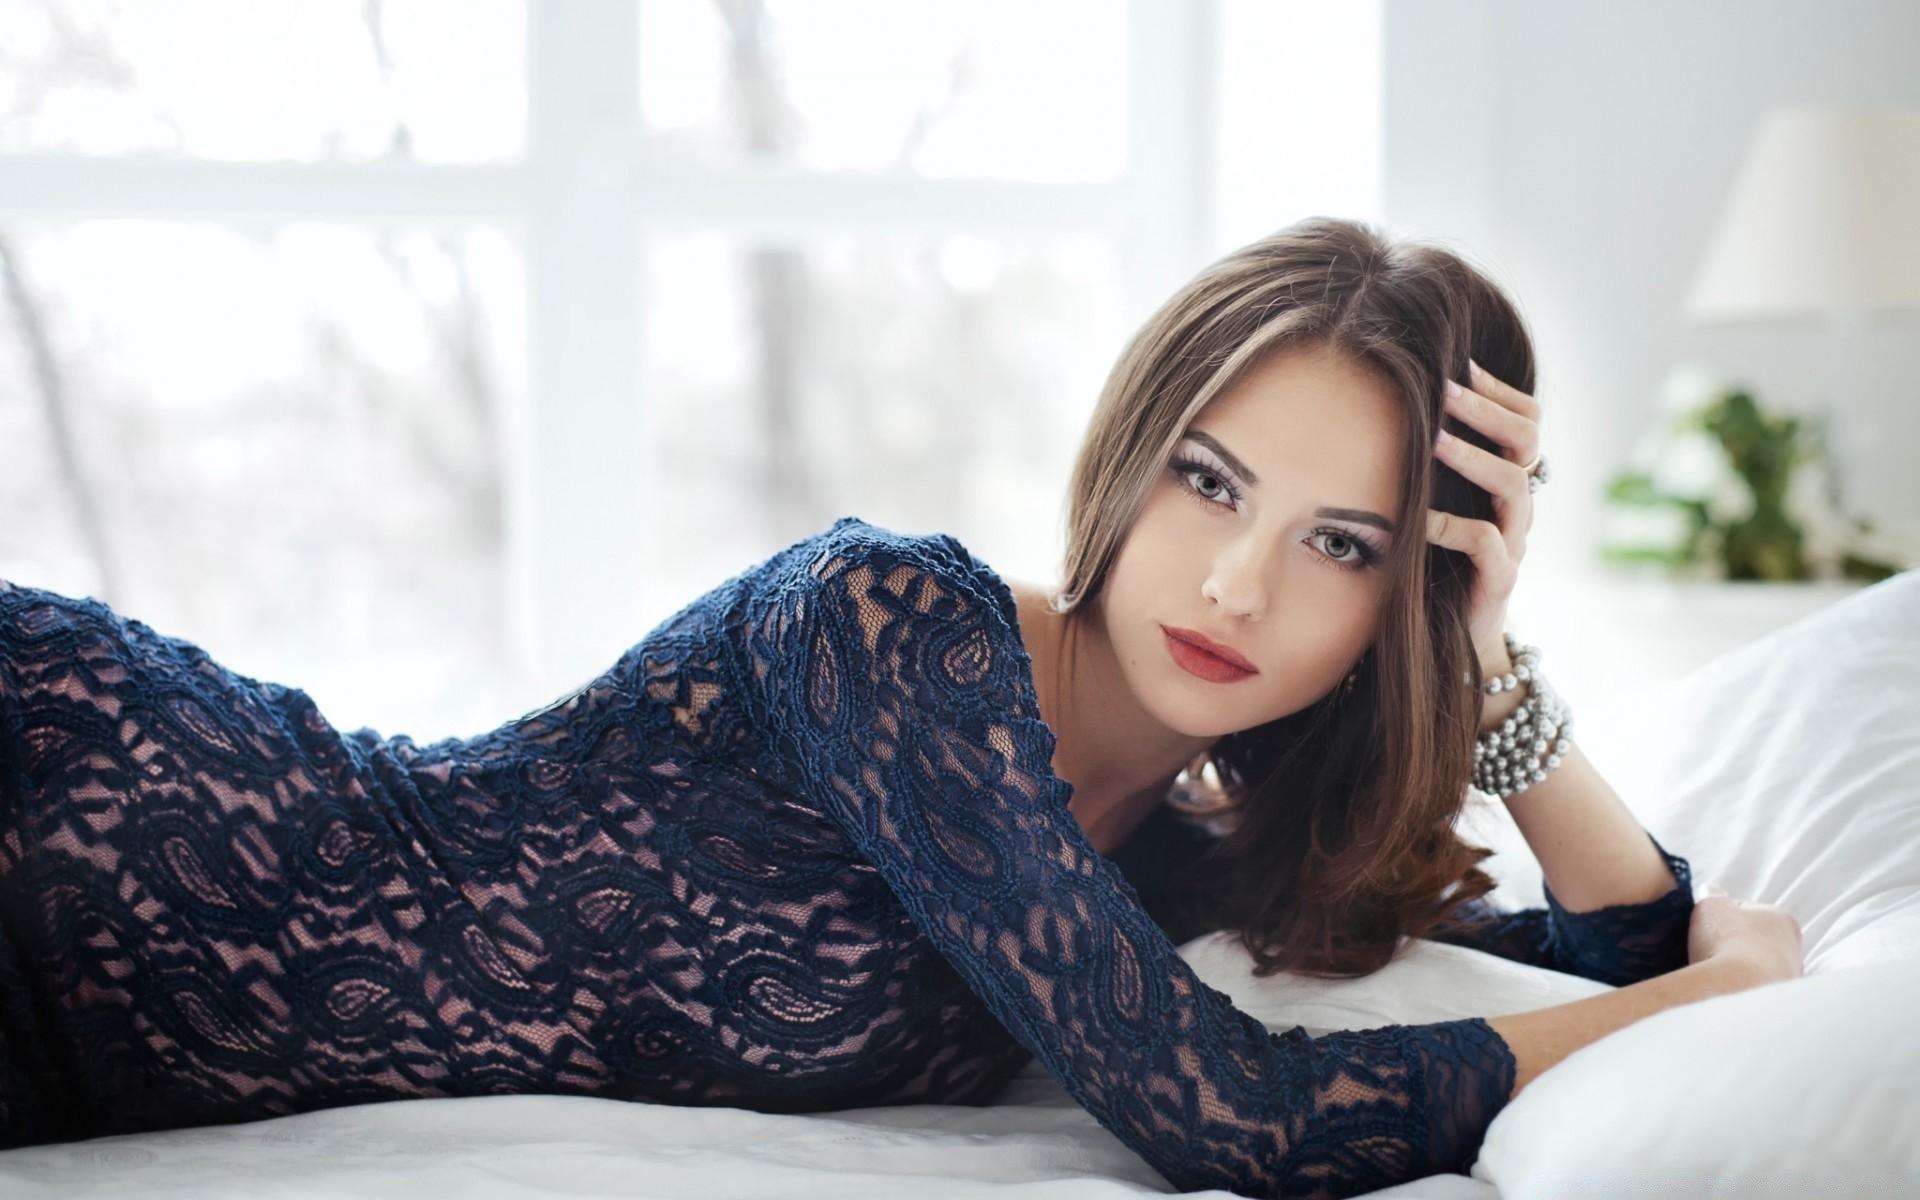 Hot pretty woman #8